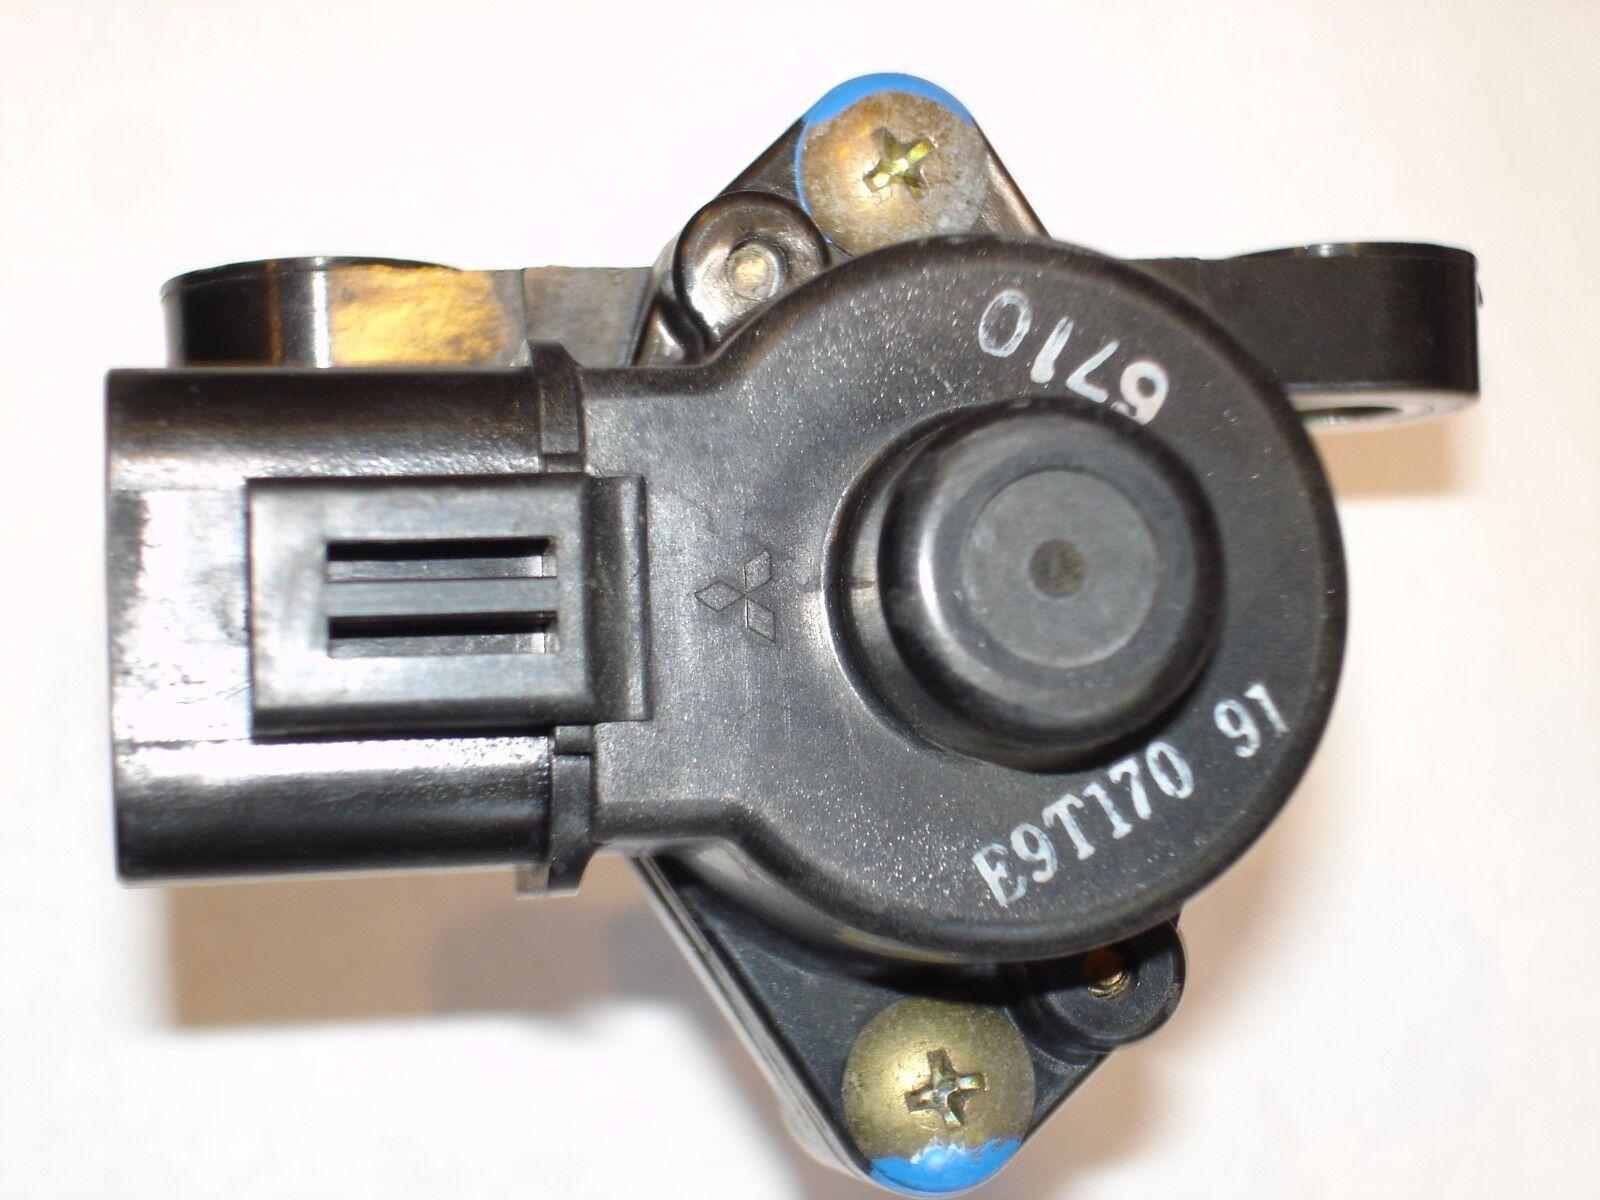 95-98 nissan maxima mitsubishi evap purge volume control valve